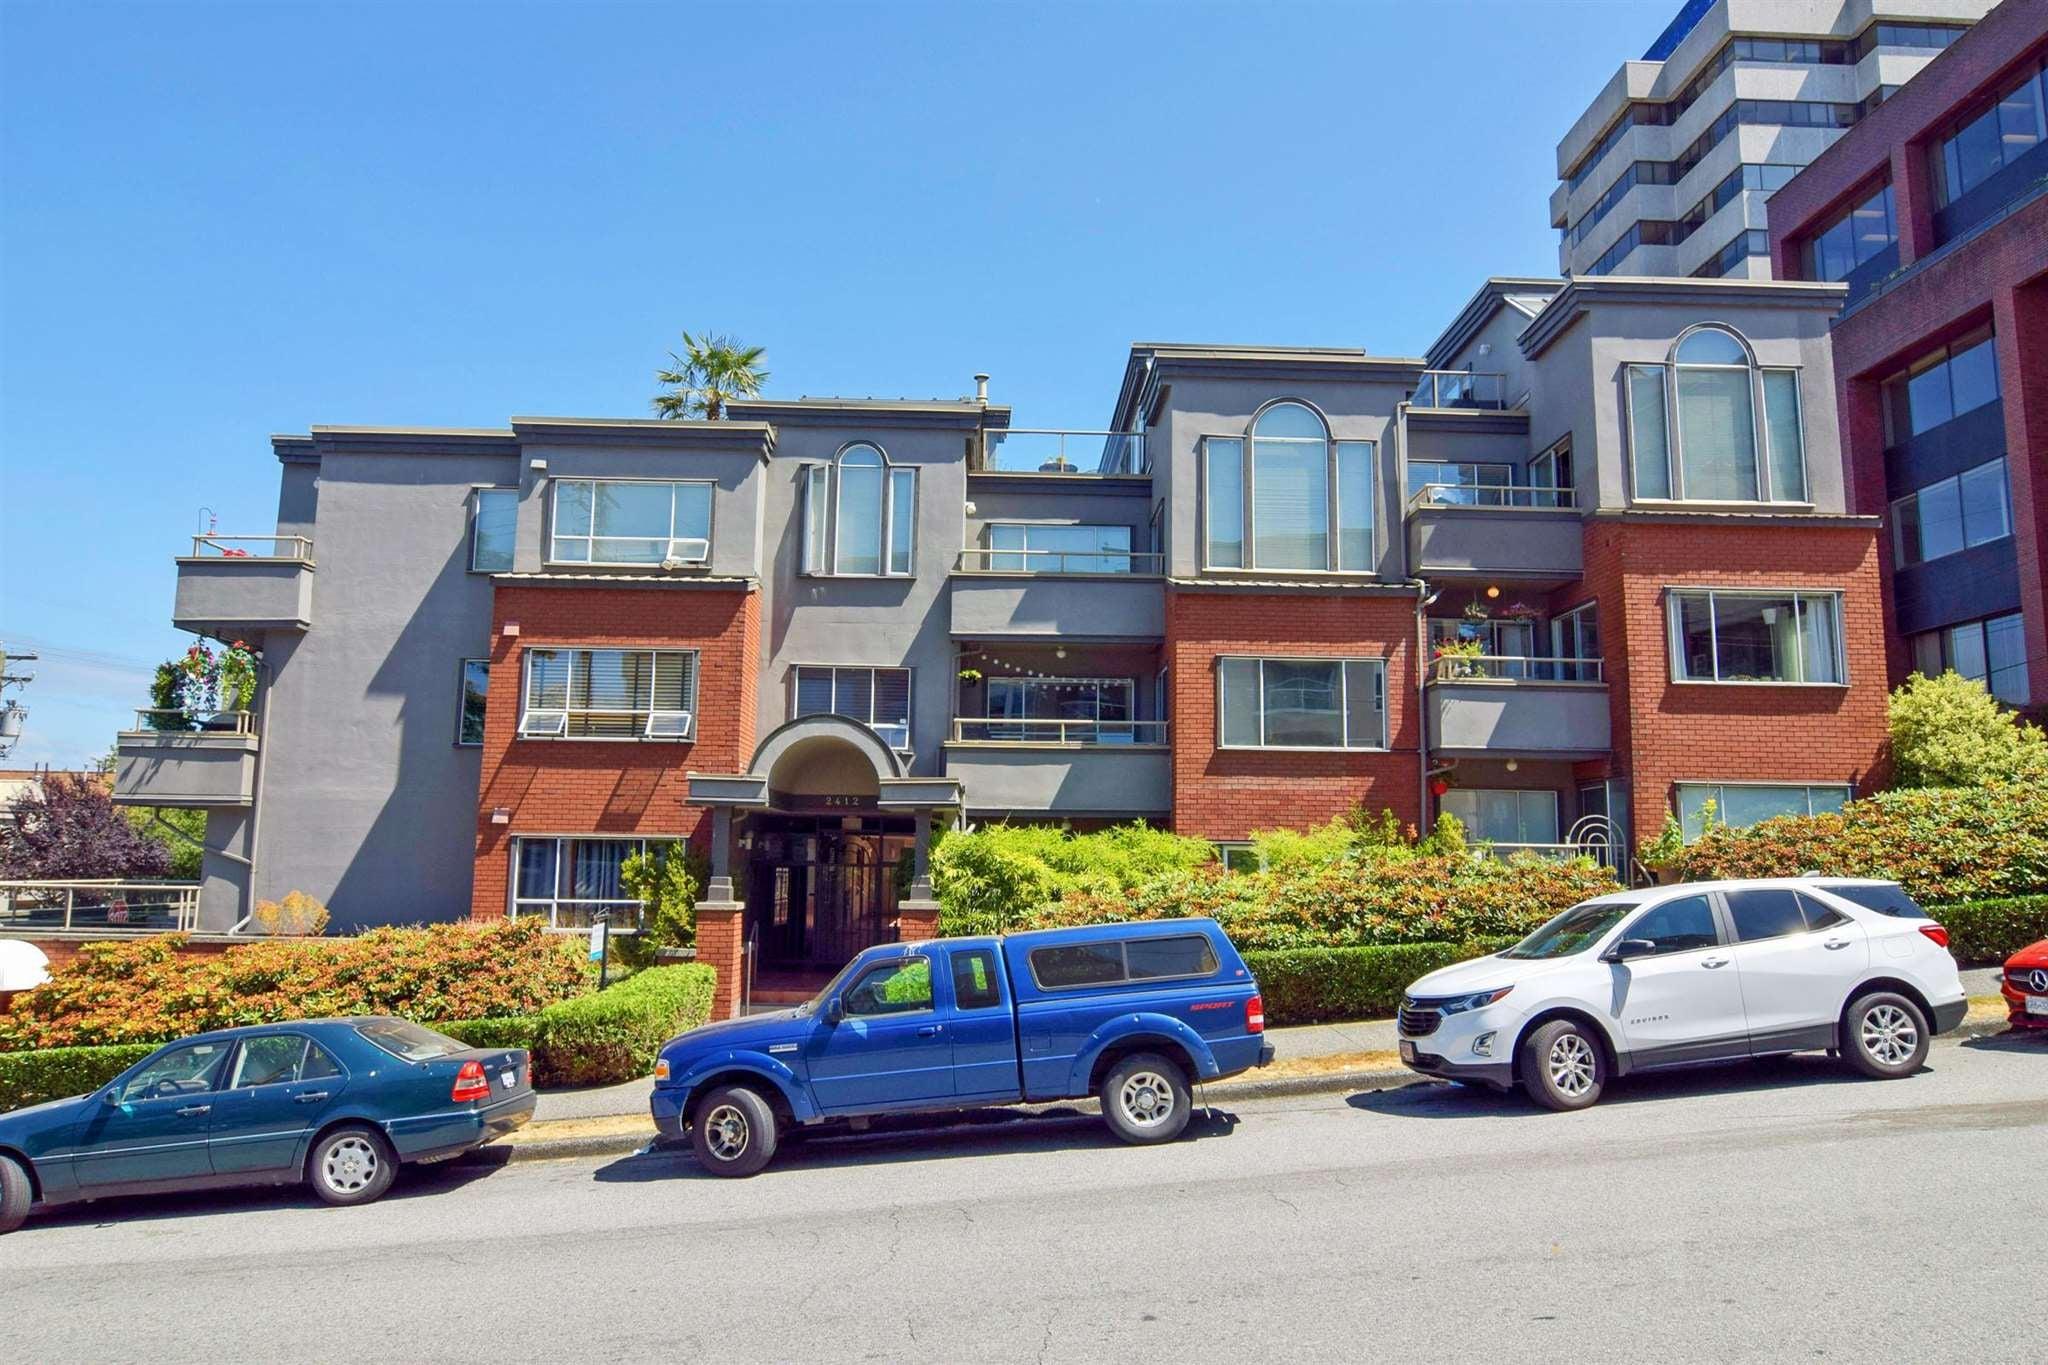 212 2412 ALDER STREET - Fairview VW Apartment/Condo for sale, 2 Bedrooms (R2602780)